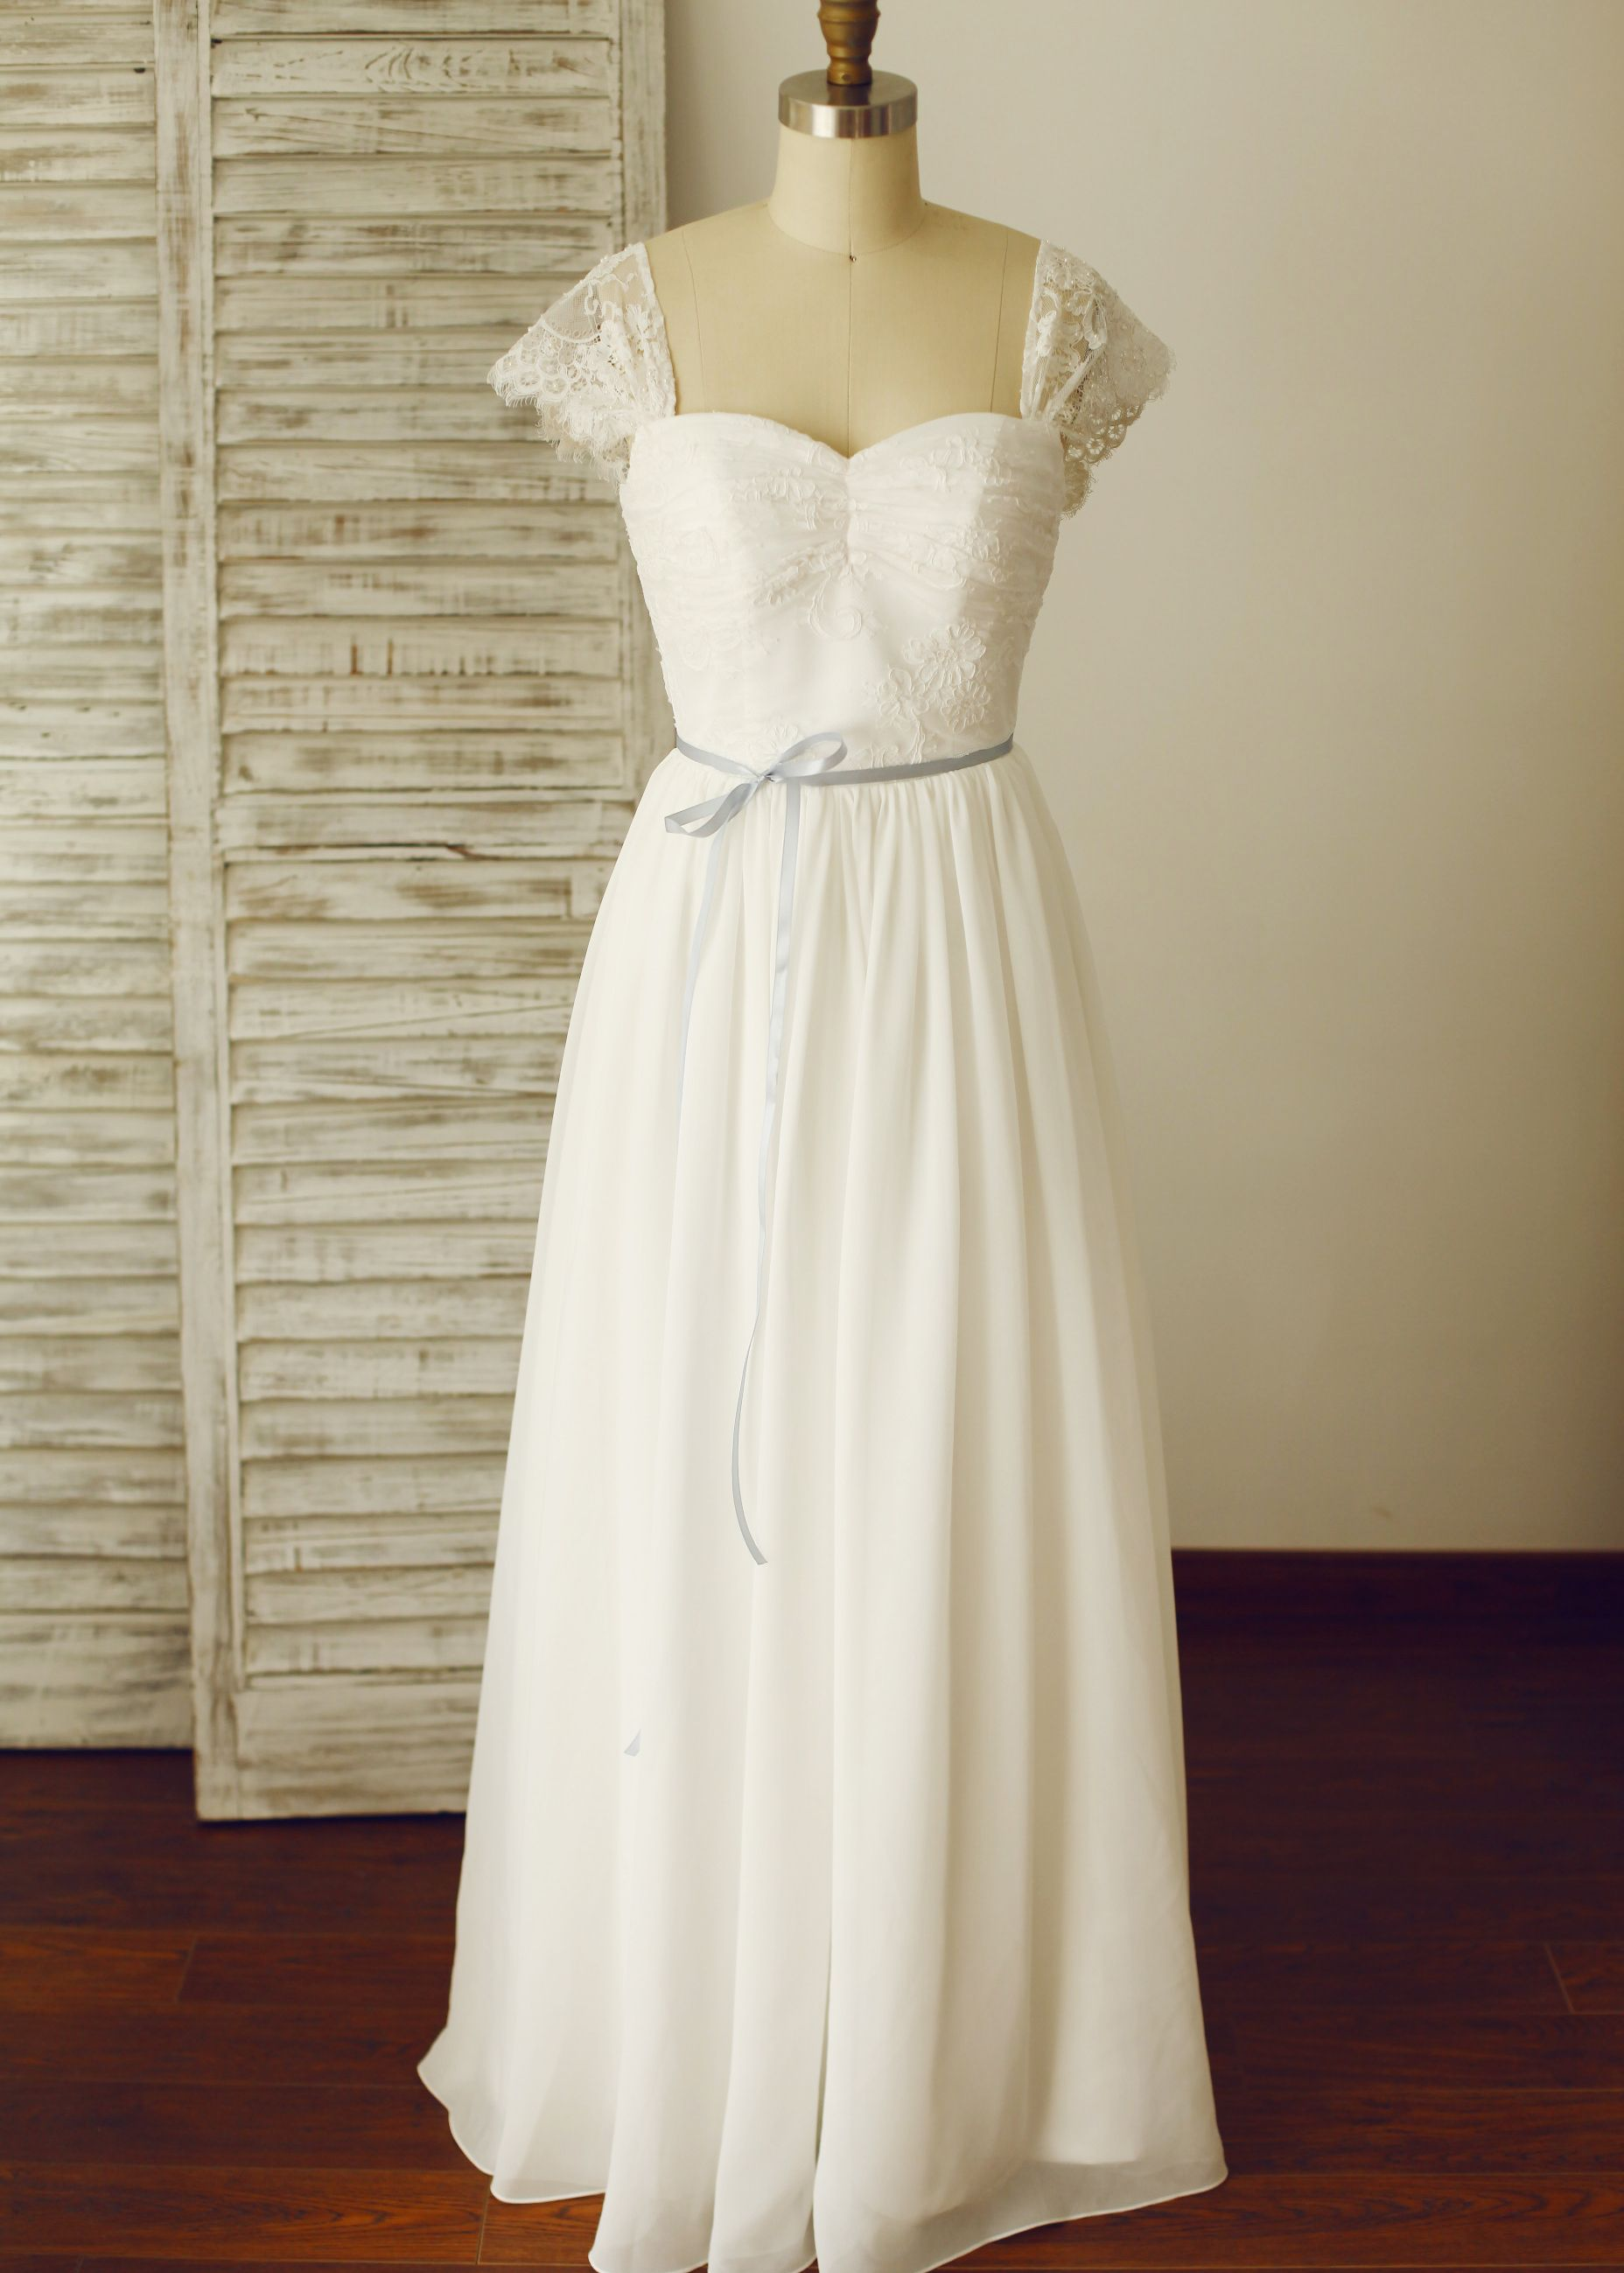 Cap Sleeves Ivory Lace Chiffon Corset Back Wedding Dress